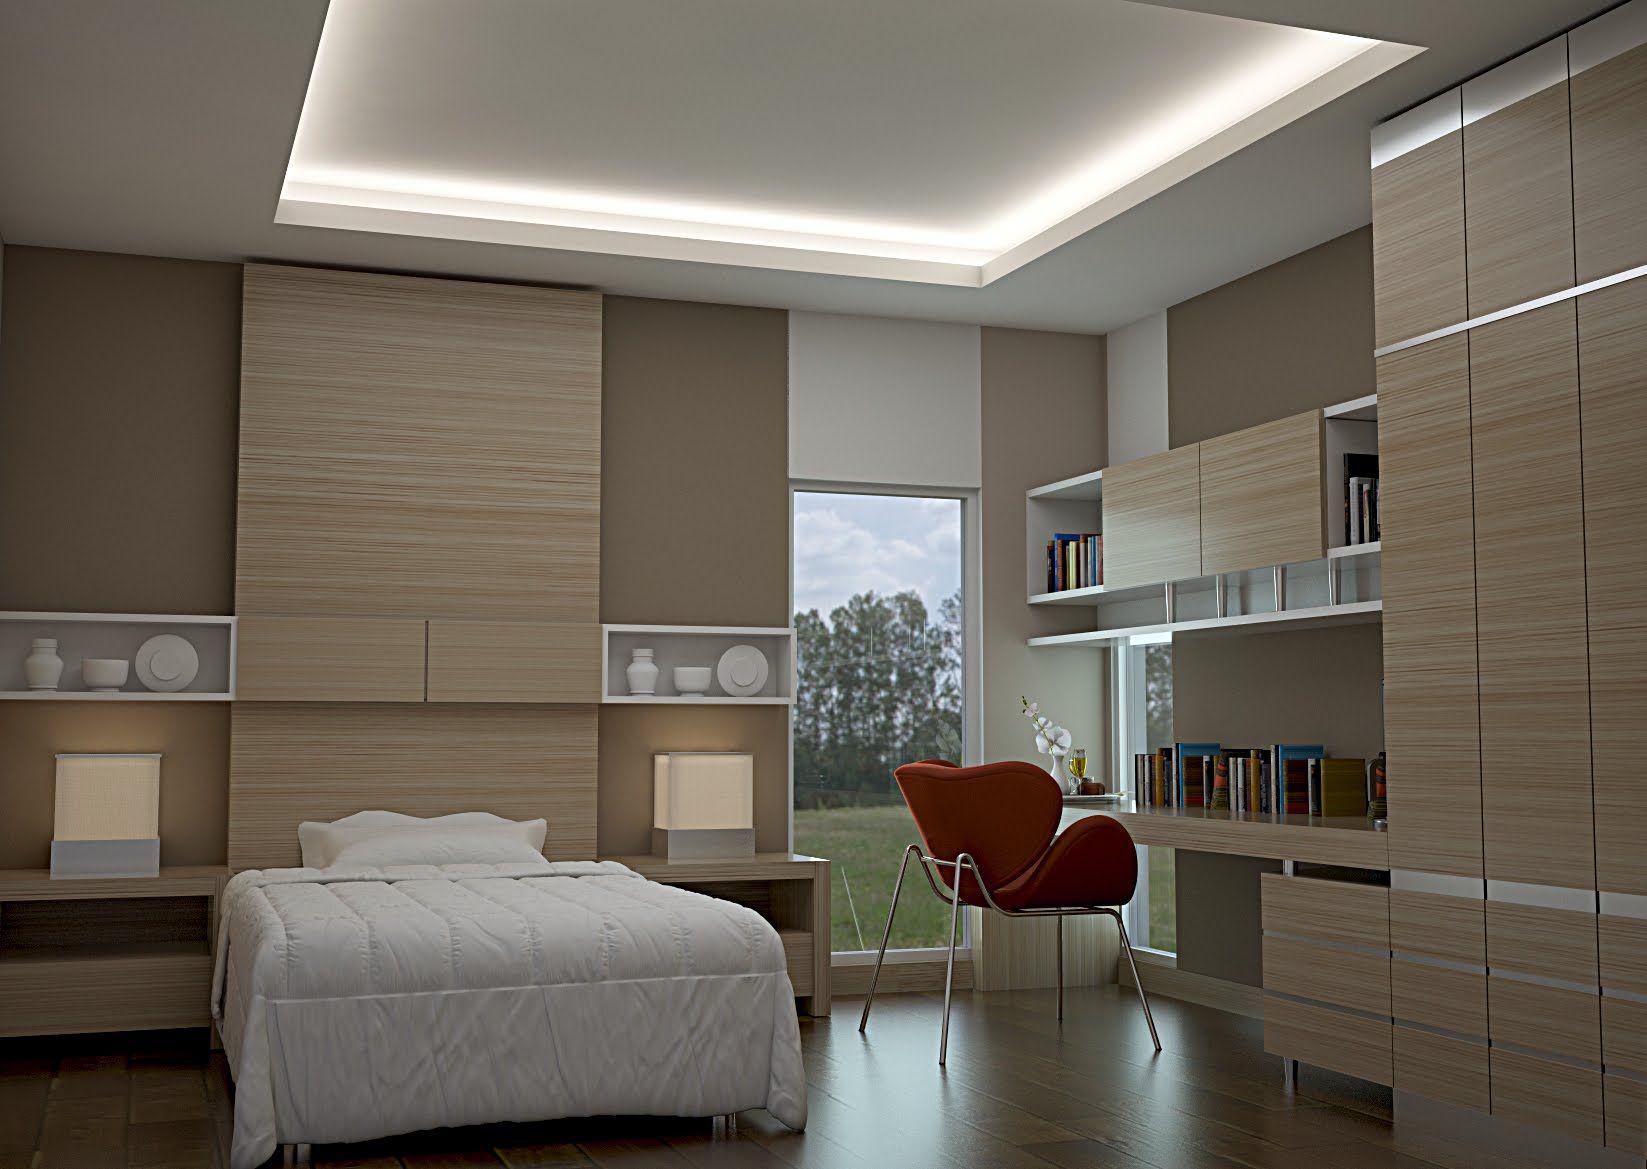 VRAY TUTORIAL SMALL BEDROOM DESIGNmodel & rendering in 6DMAX